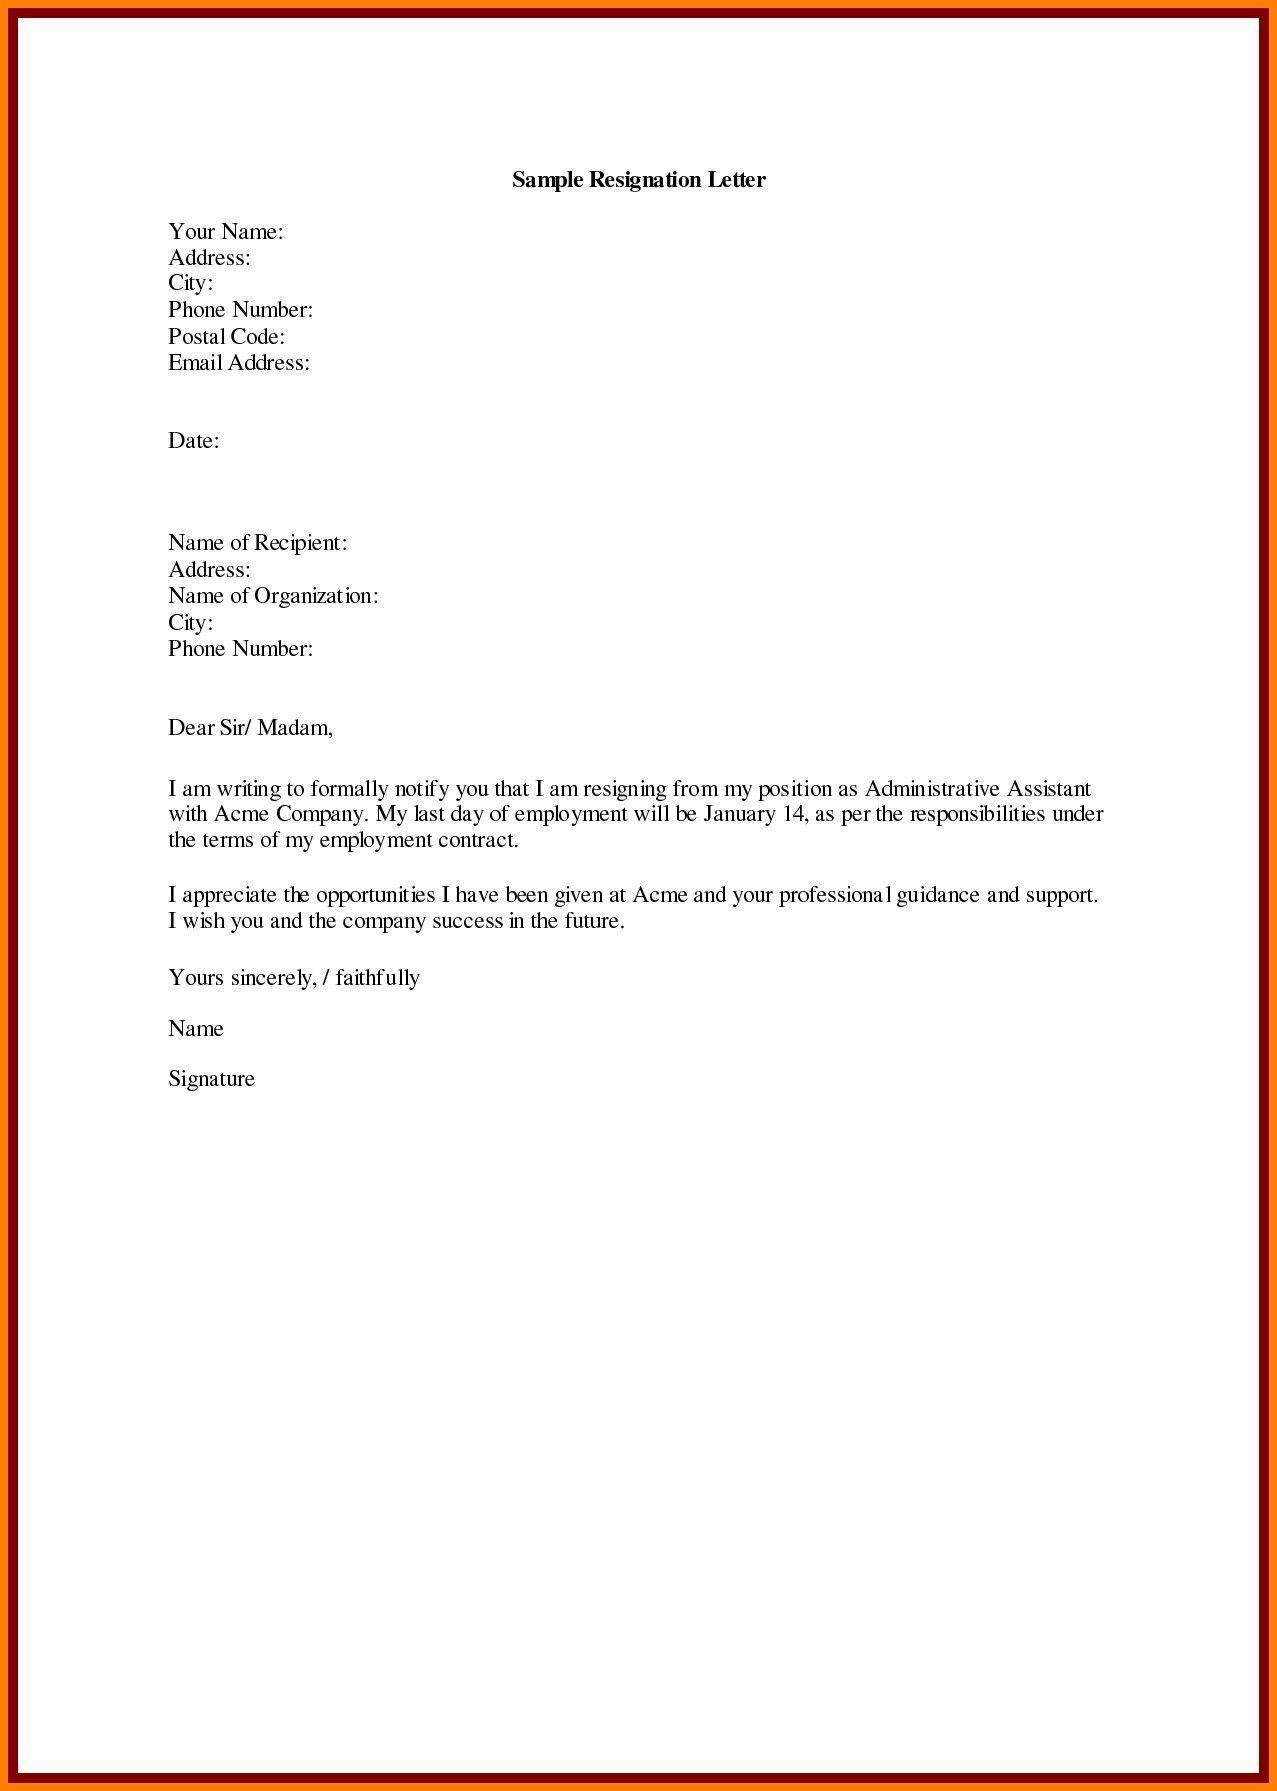 Download Fresh Job Resign Letter Format At Https Gprime Us Job